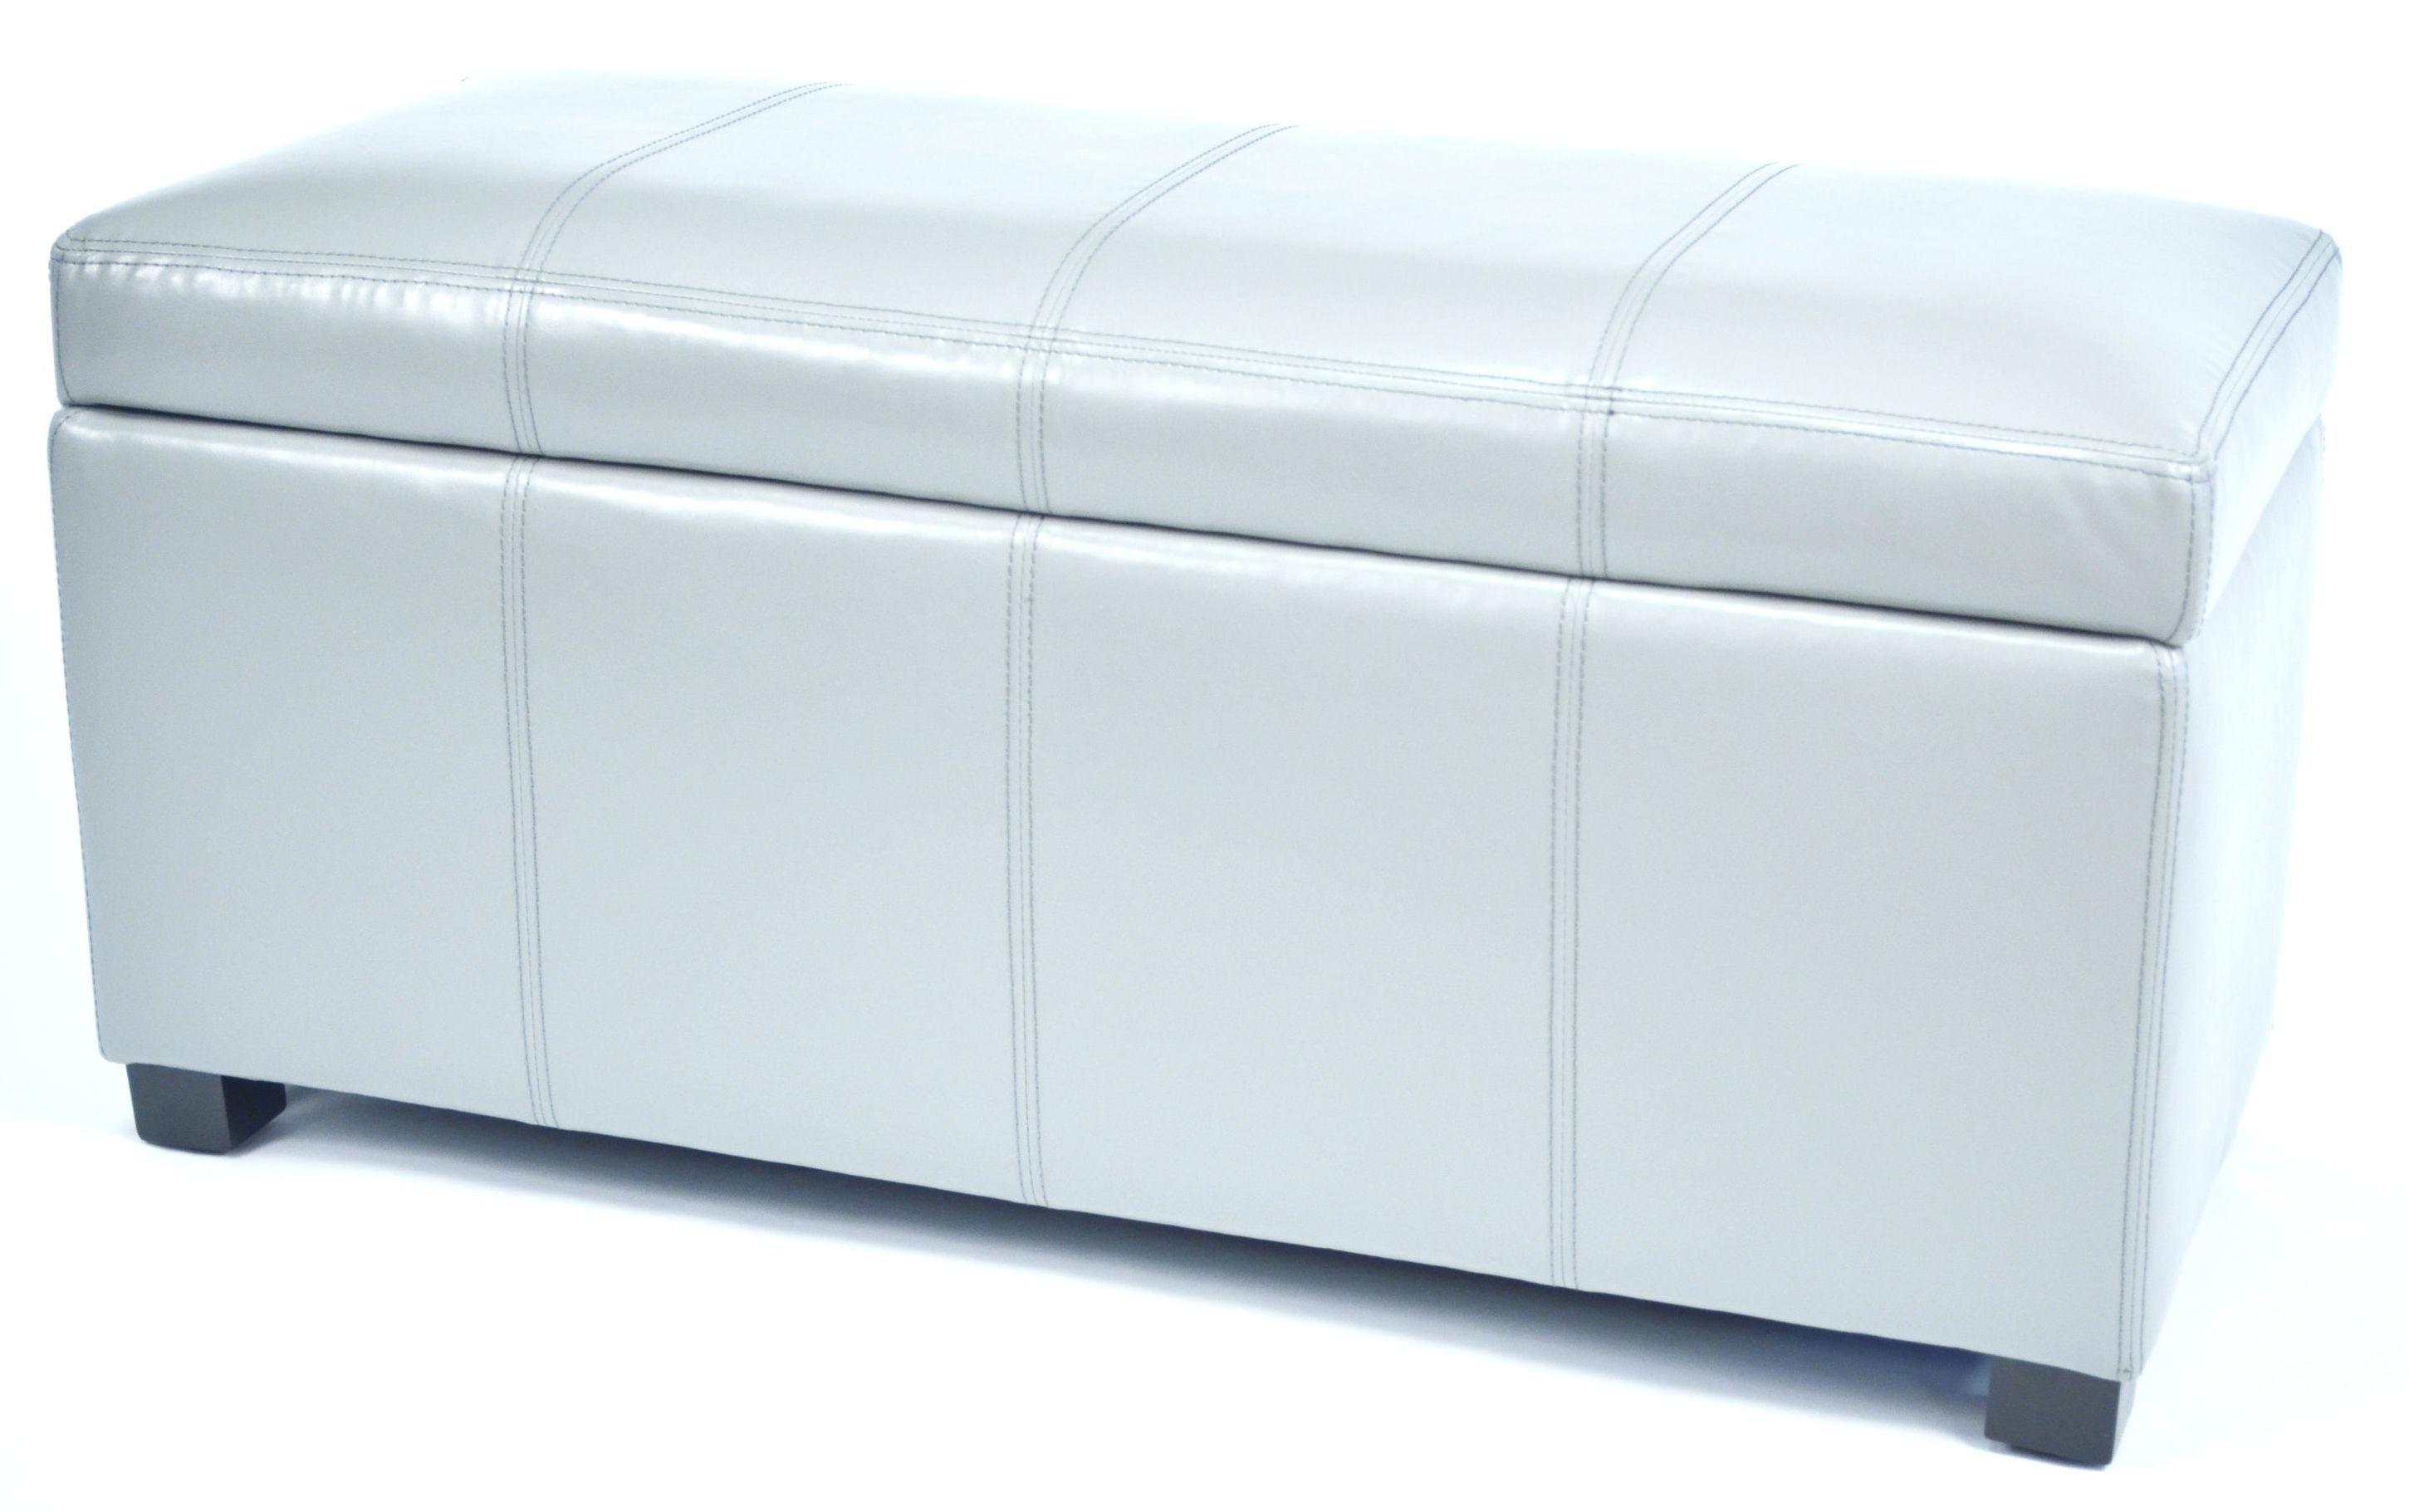 Ariel grey faux leather storage bench wt m1157 grey warehouse of tiffany Gray storage bench